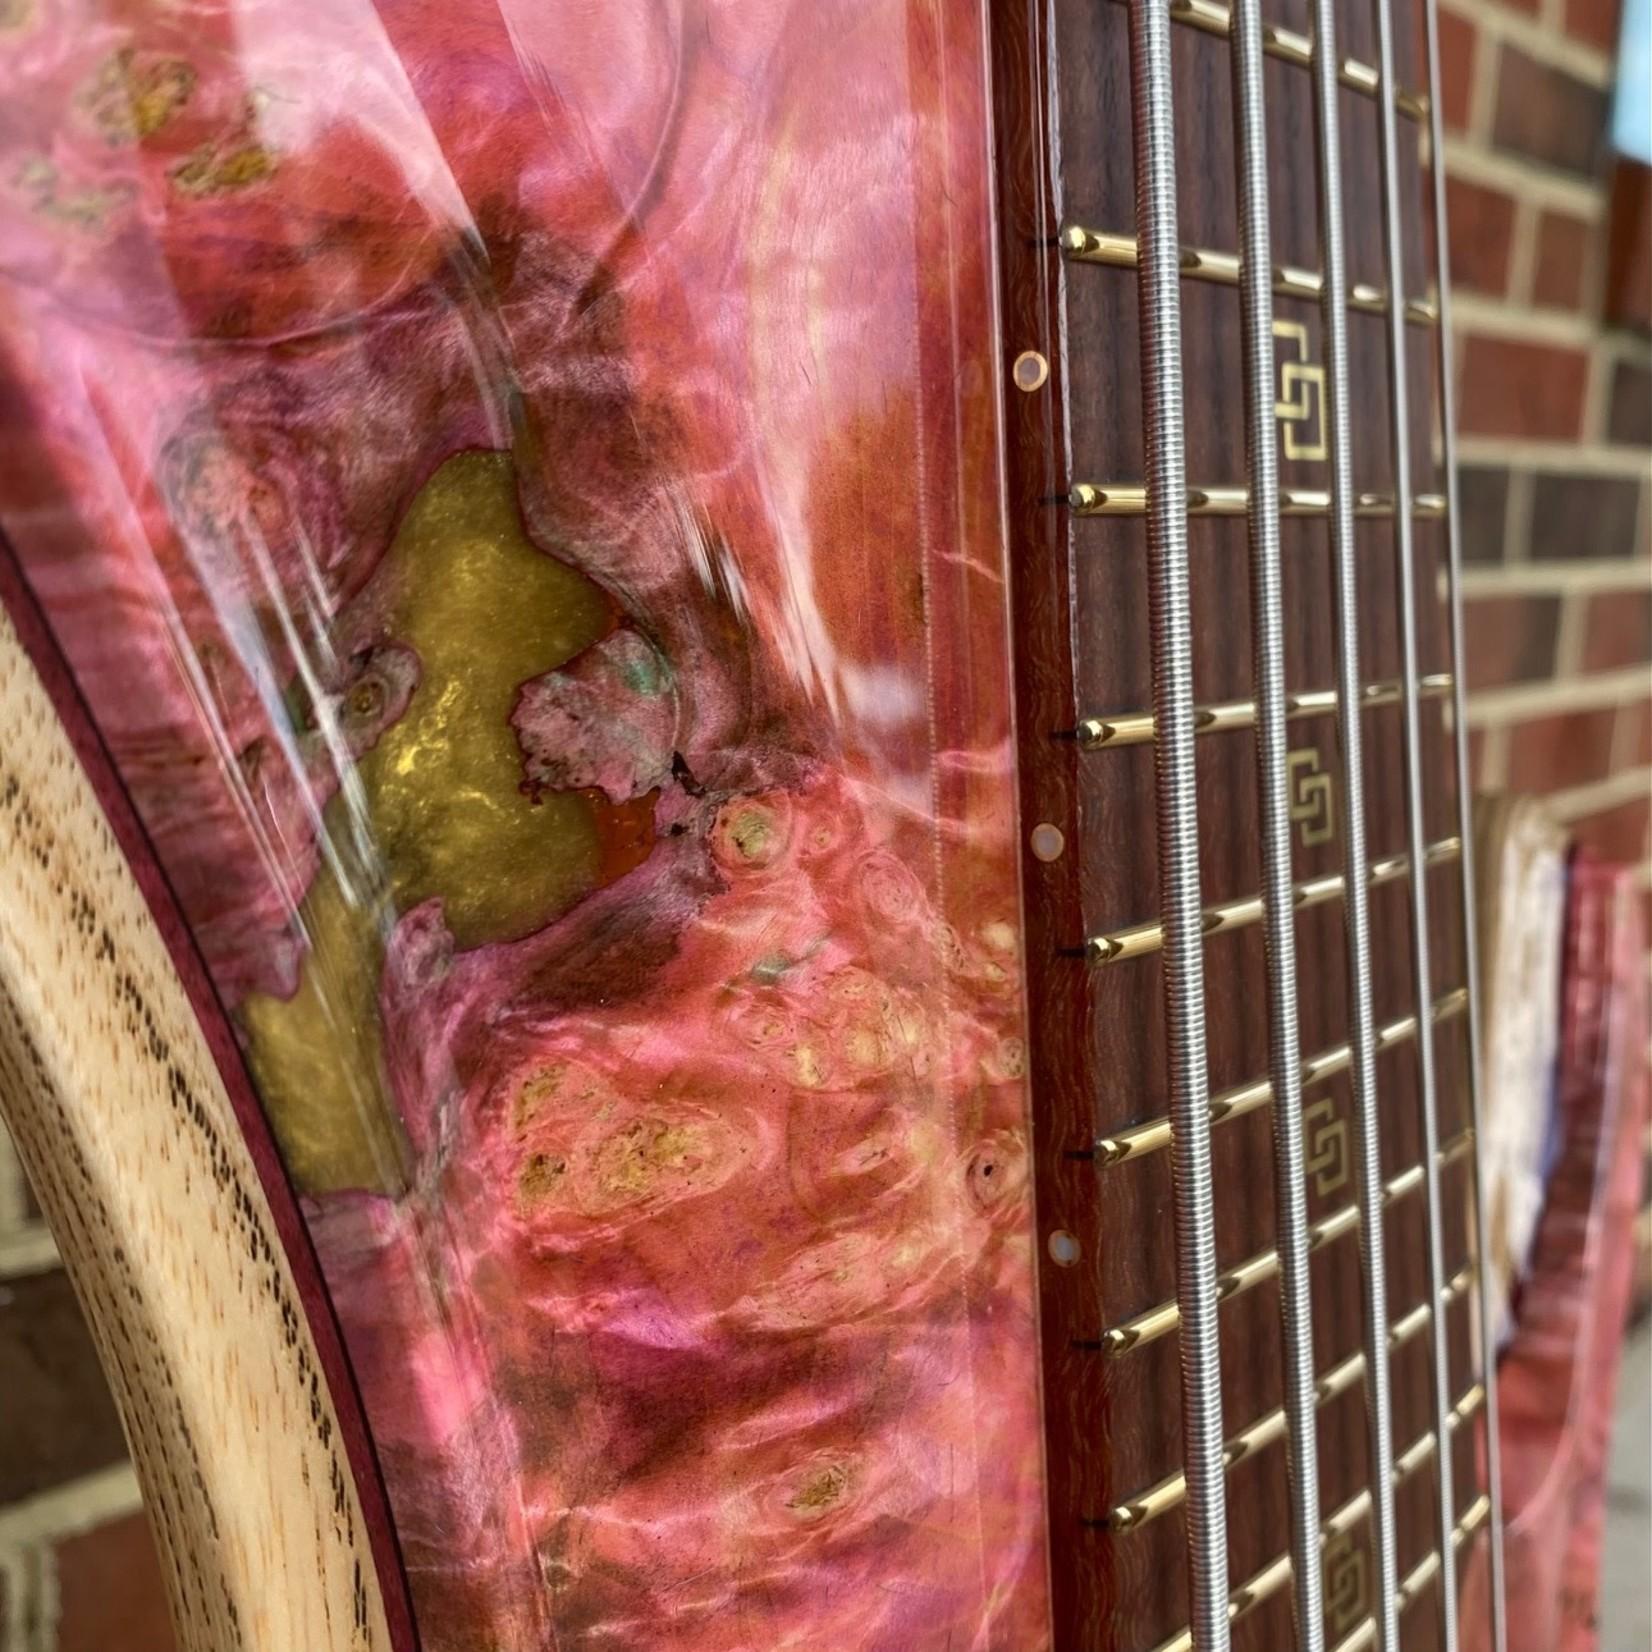 ESP ESP 2021 Exhibition Prototype Bass, 5-String, Single Cut, Stabilized Buckeye Burl w/ Blue + Pink Resin, Swamp Ash Body